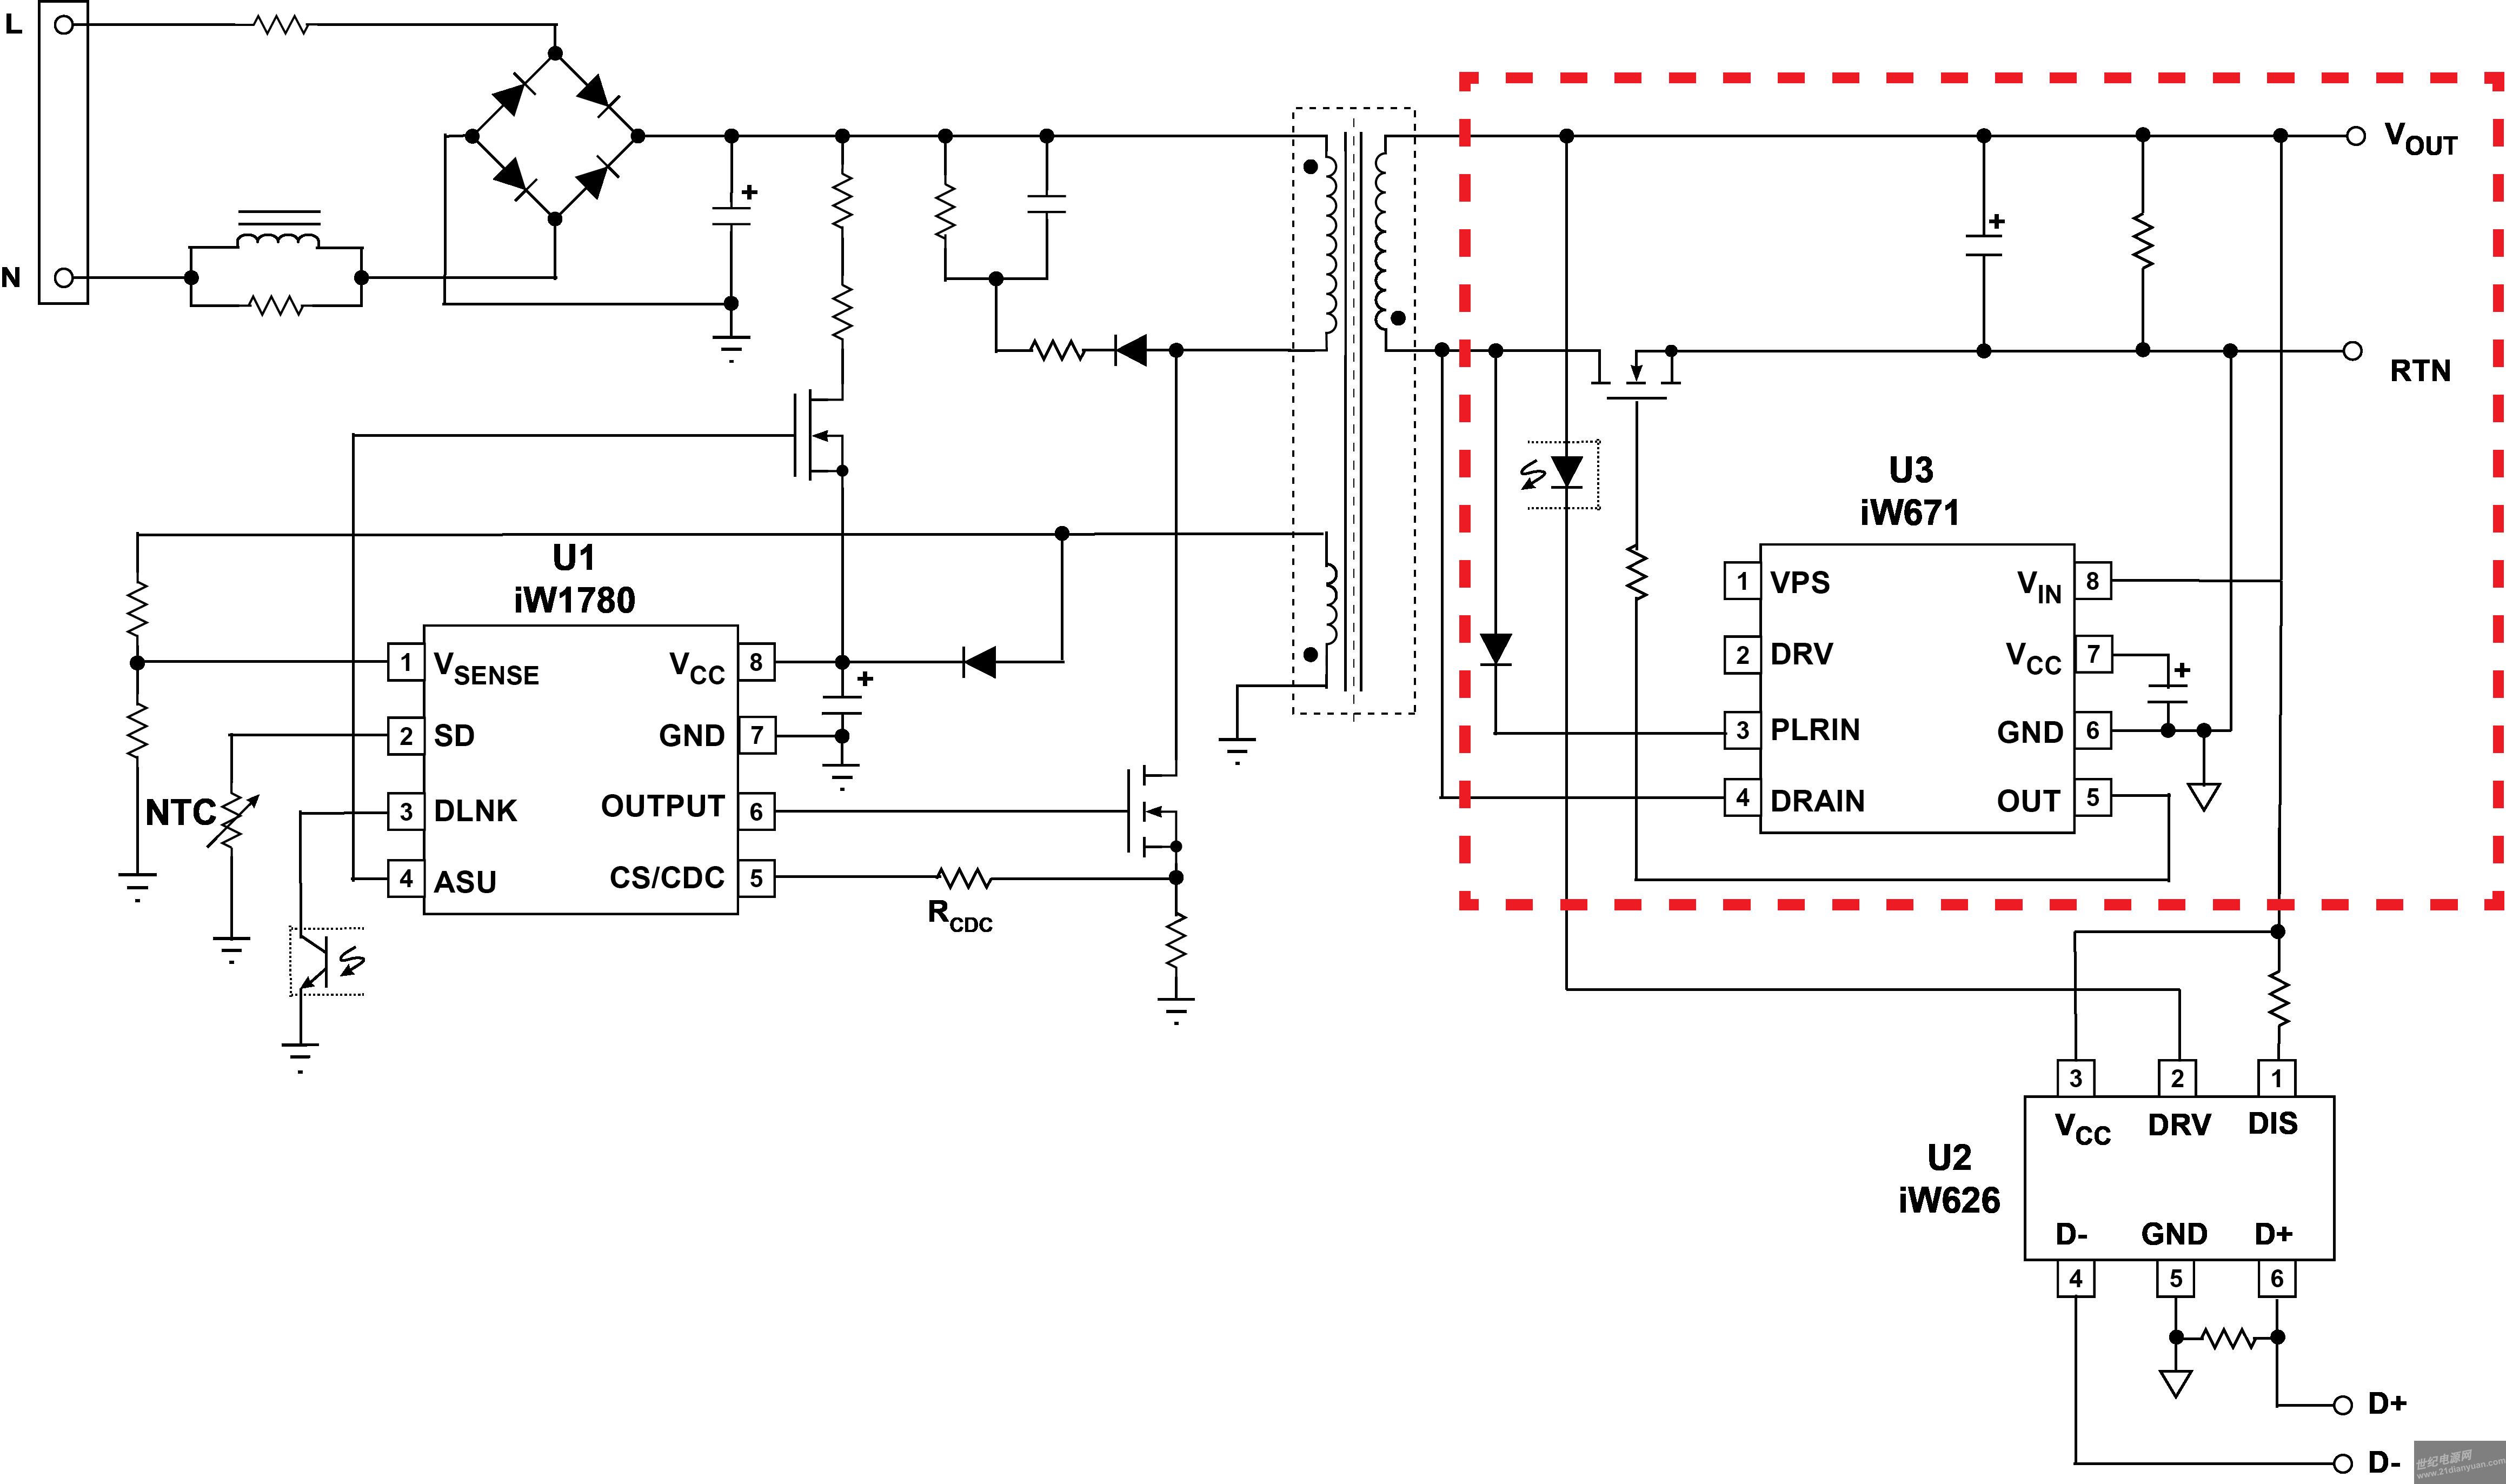 图5. 具有二次侧同步整流的qualcomm® quick charge™ 2.